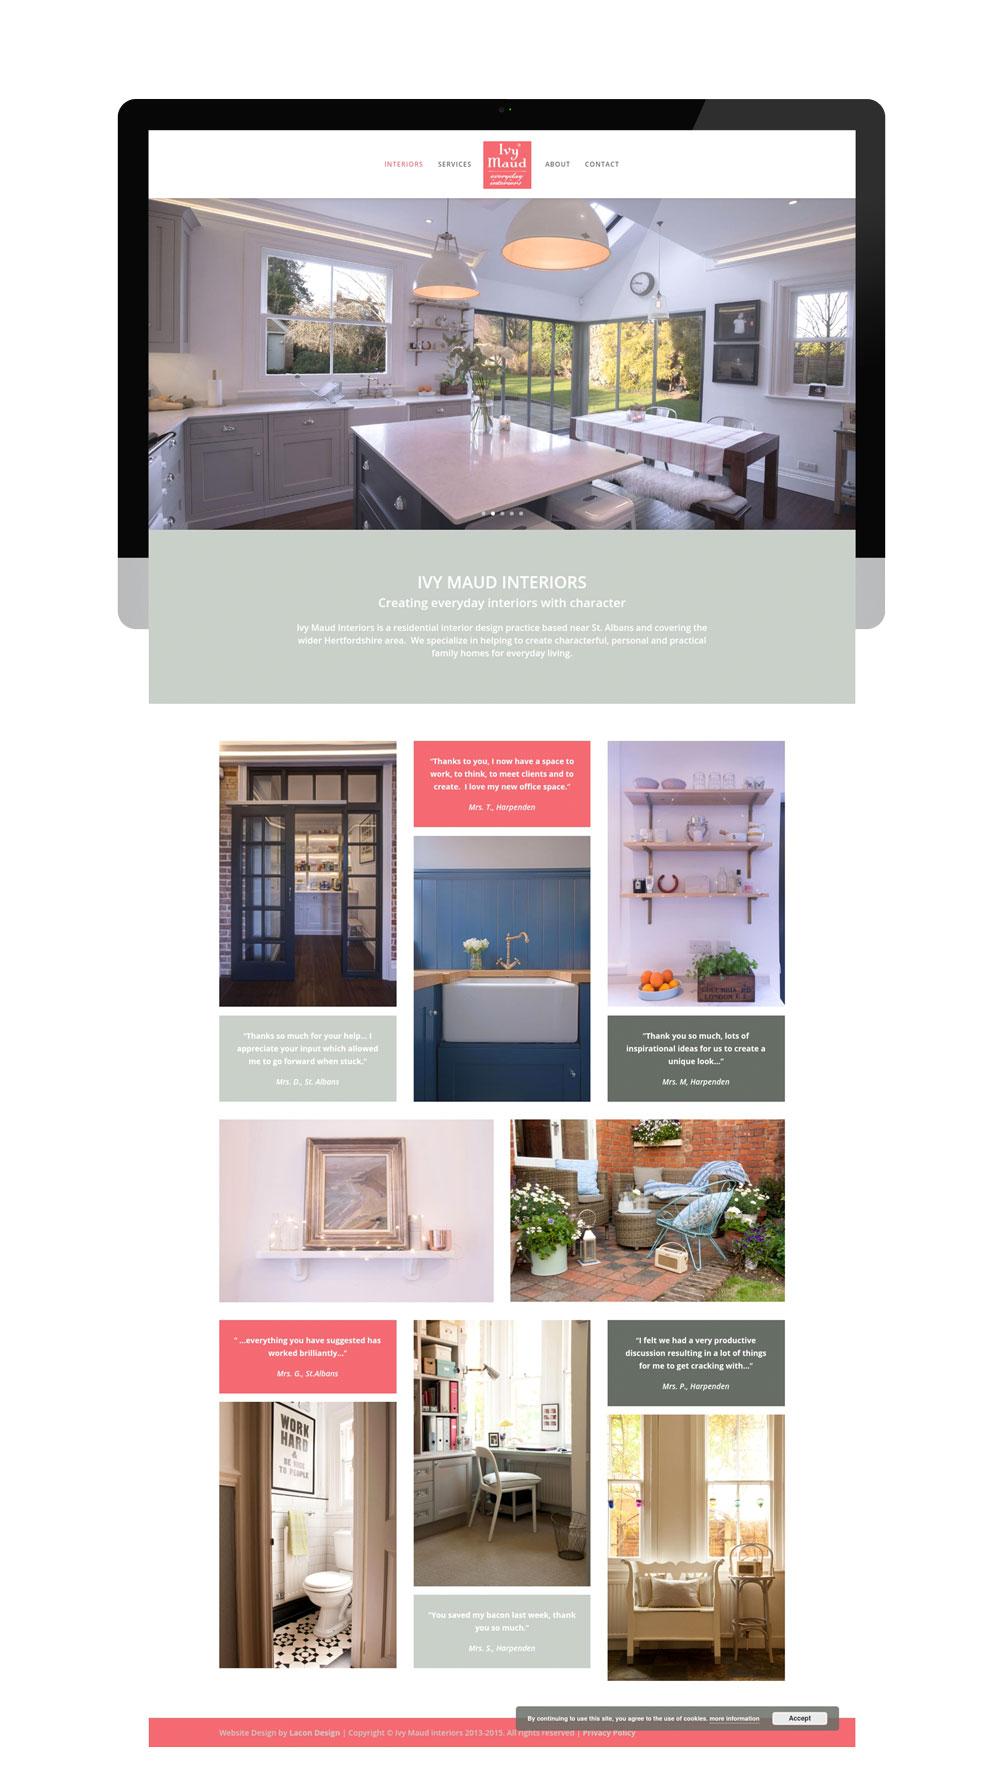 Ivy Maud Interiors Website Design